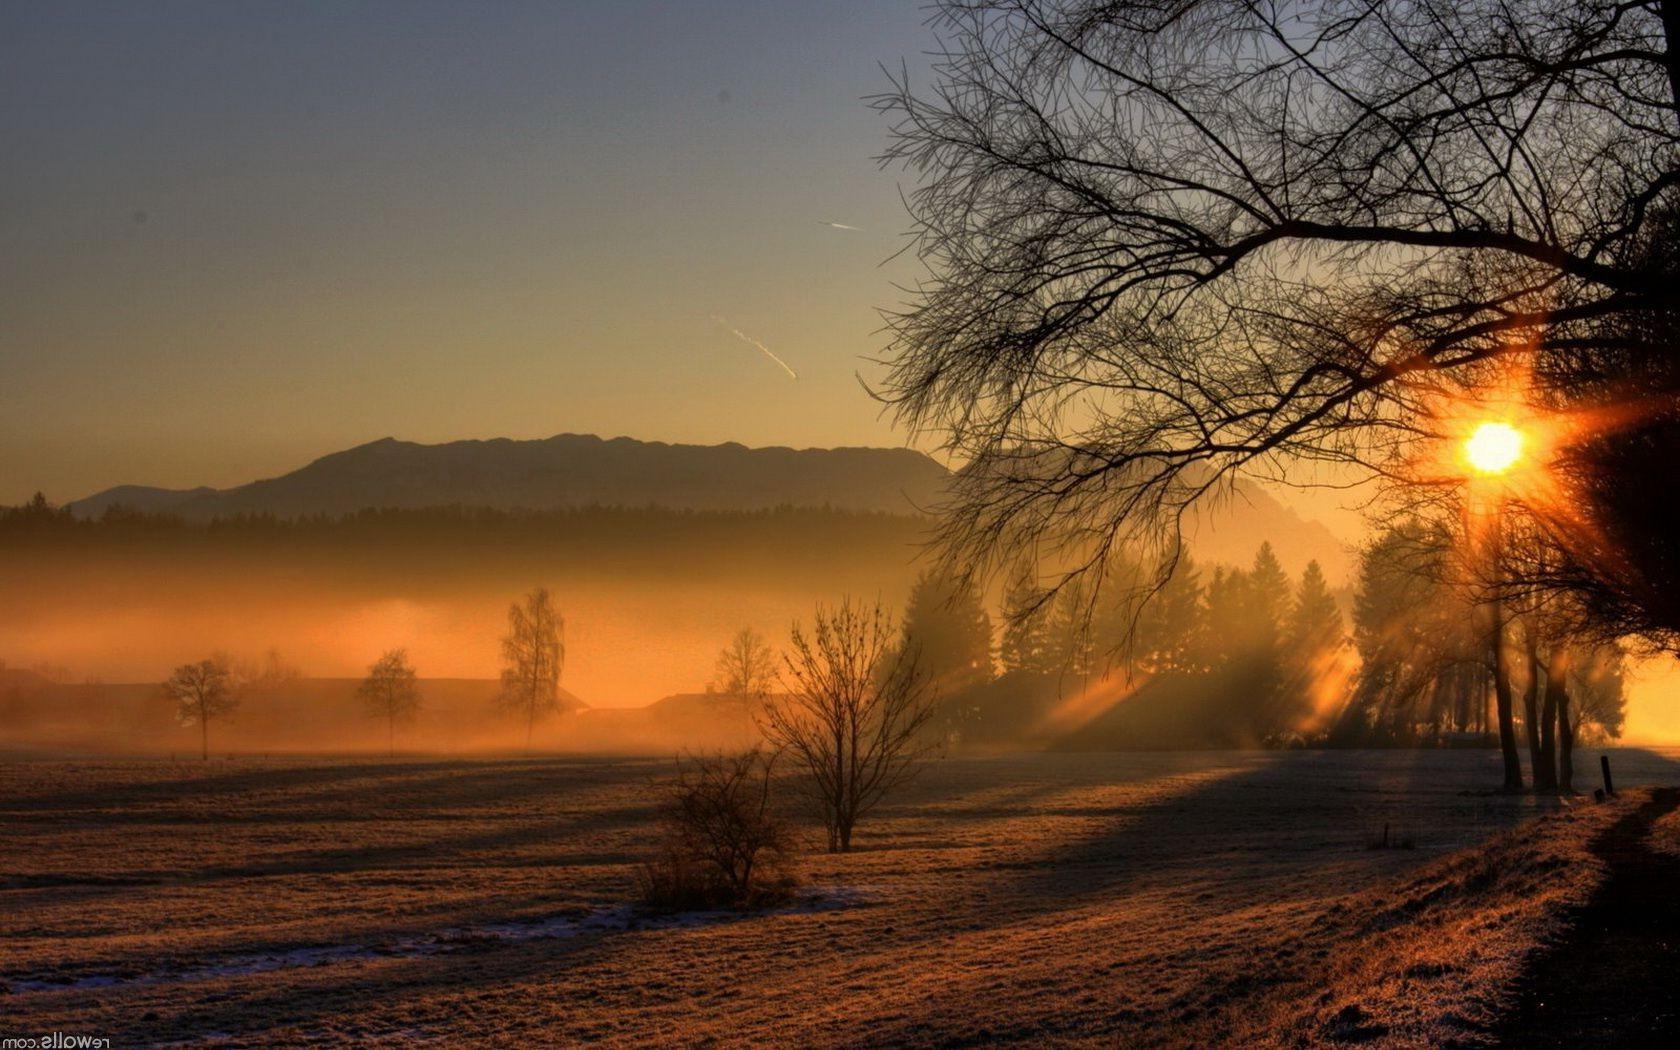 Восход солнца картинки стихи